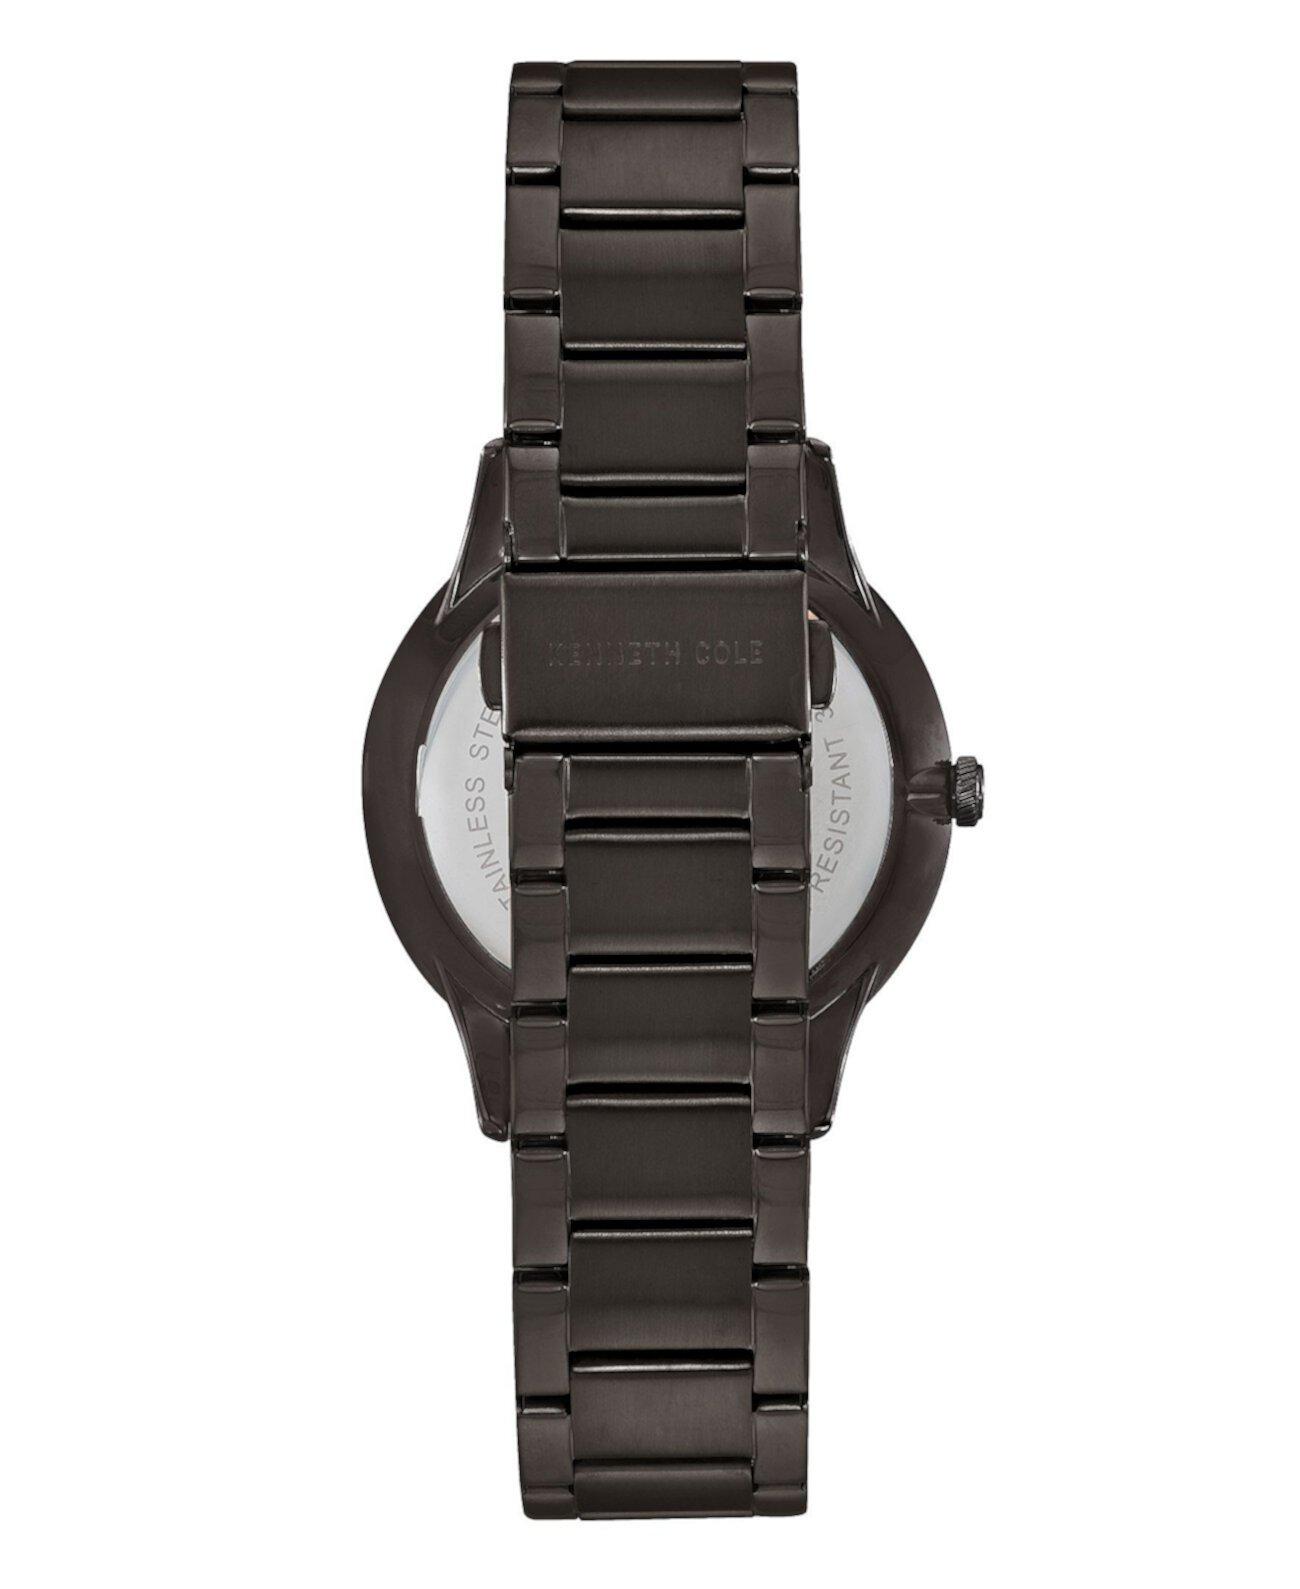 Мужские часы-браслет из нержавеющей стали Gunmetal, 41мм Kenneth Cole New York